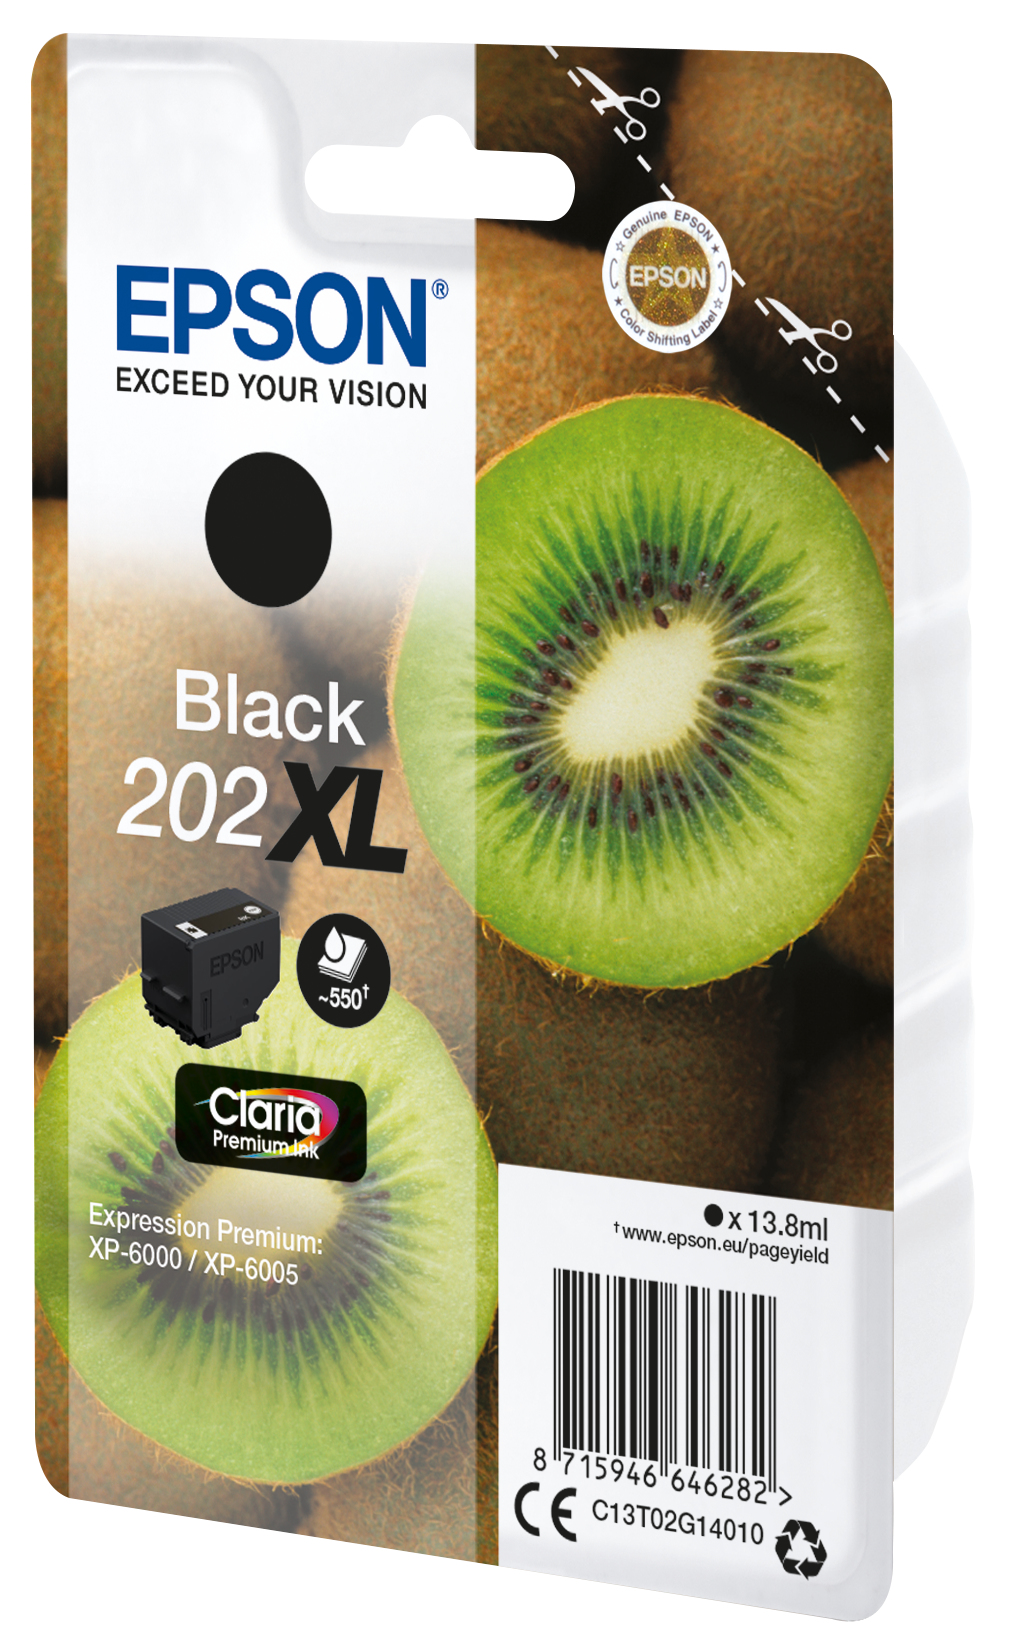 Epson-C13T02G14020-Kiwi-Singlepack-Black-202XL-Claria-Premium-Ink-Original thumbnail 3